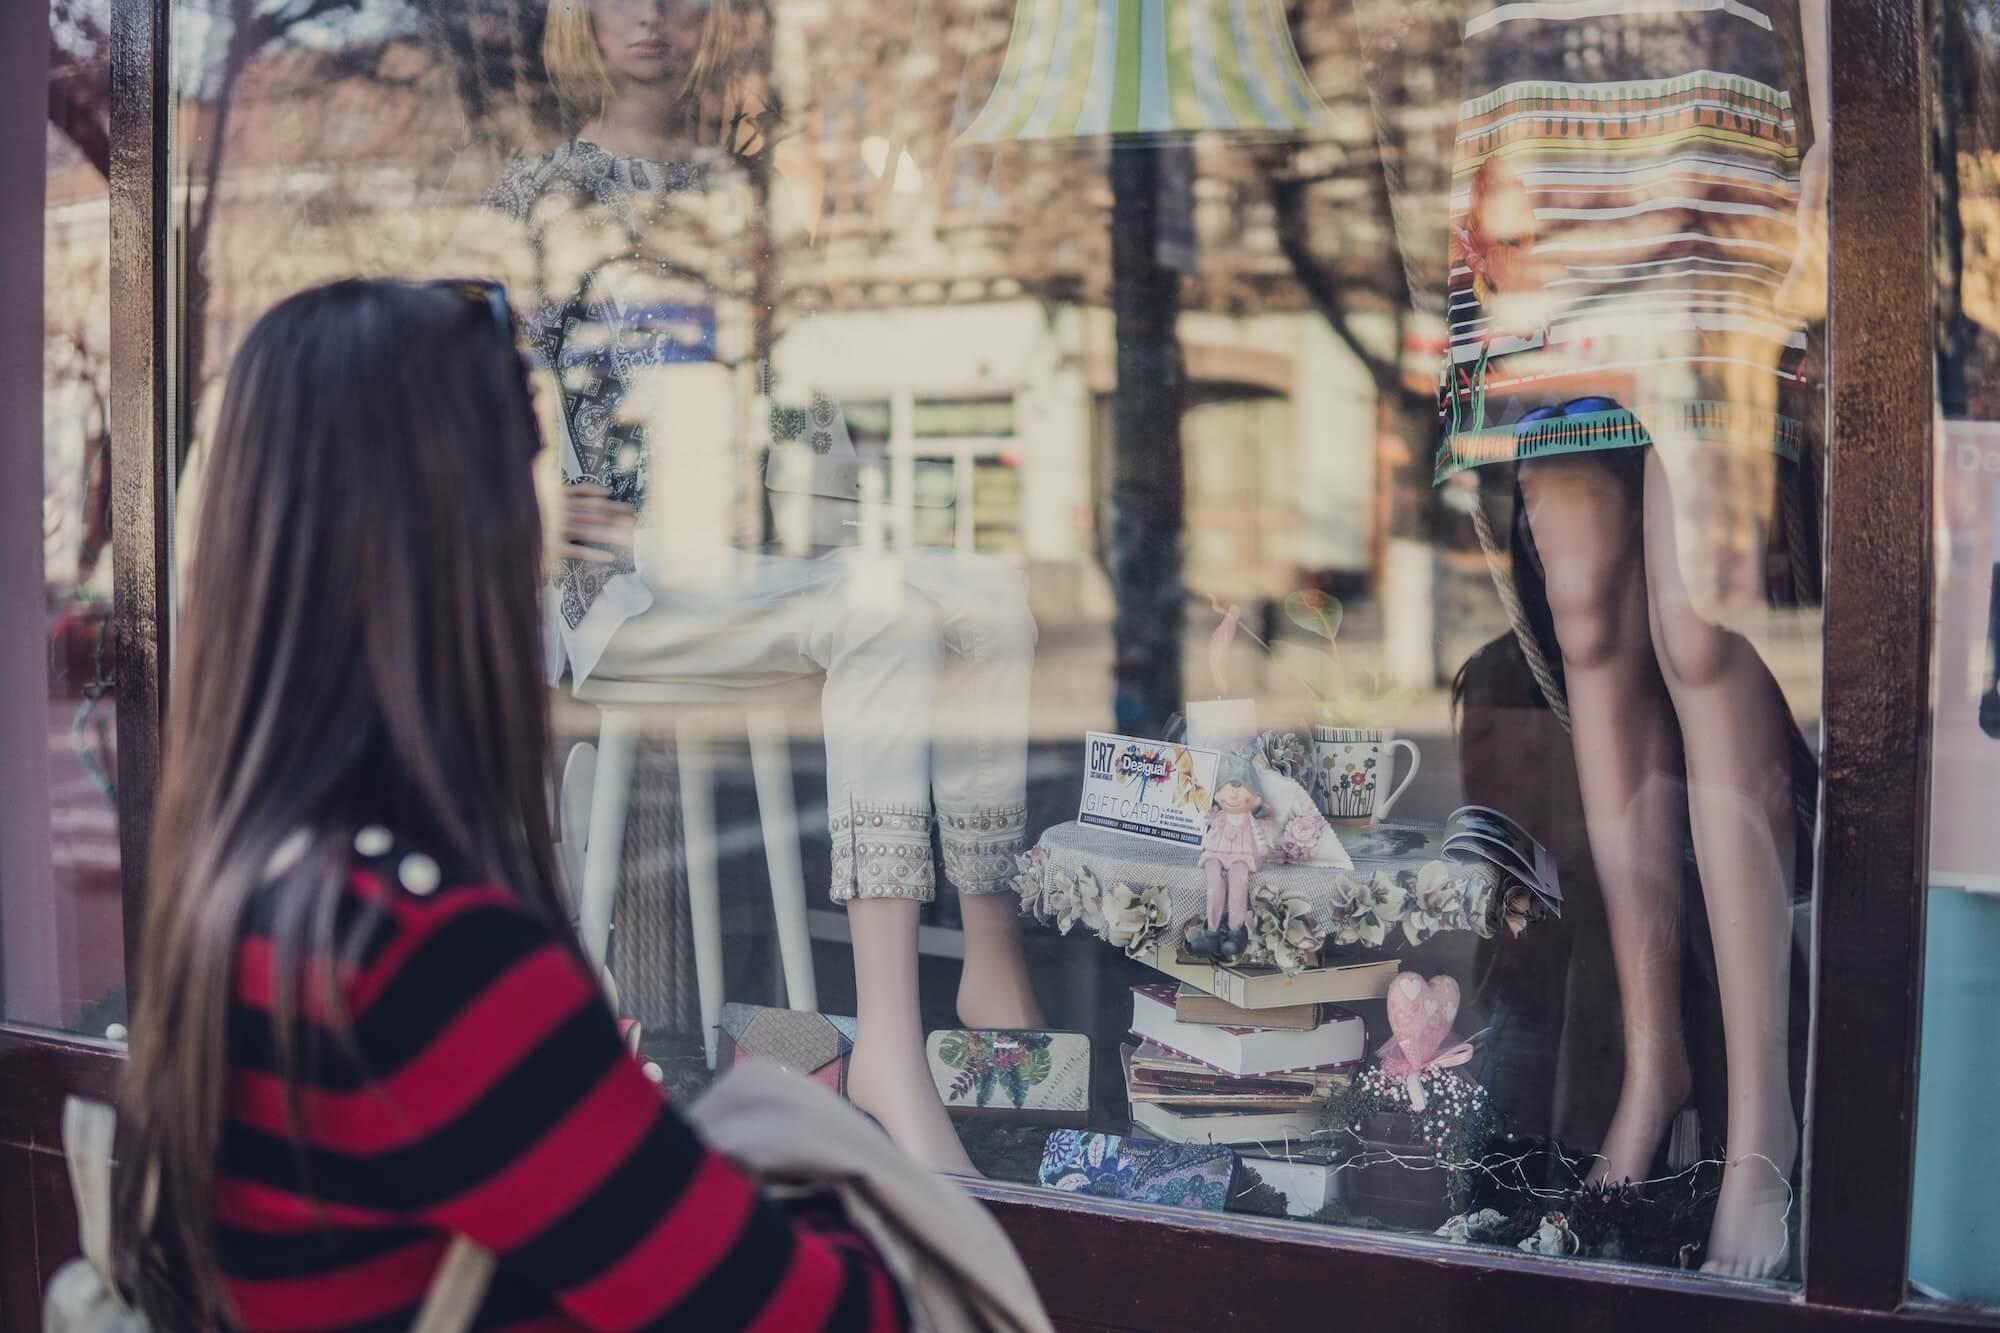 Personne regardant une vitrine de magasin